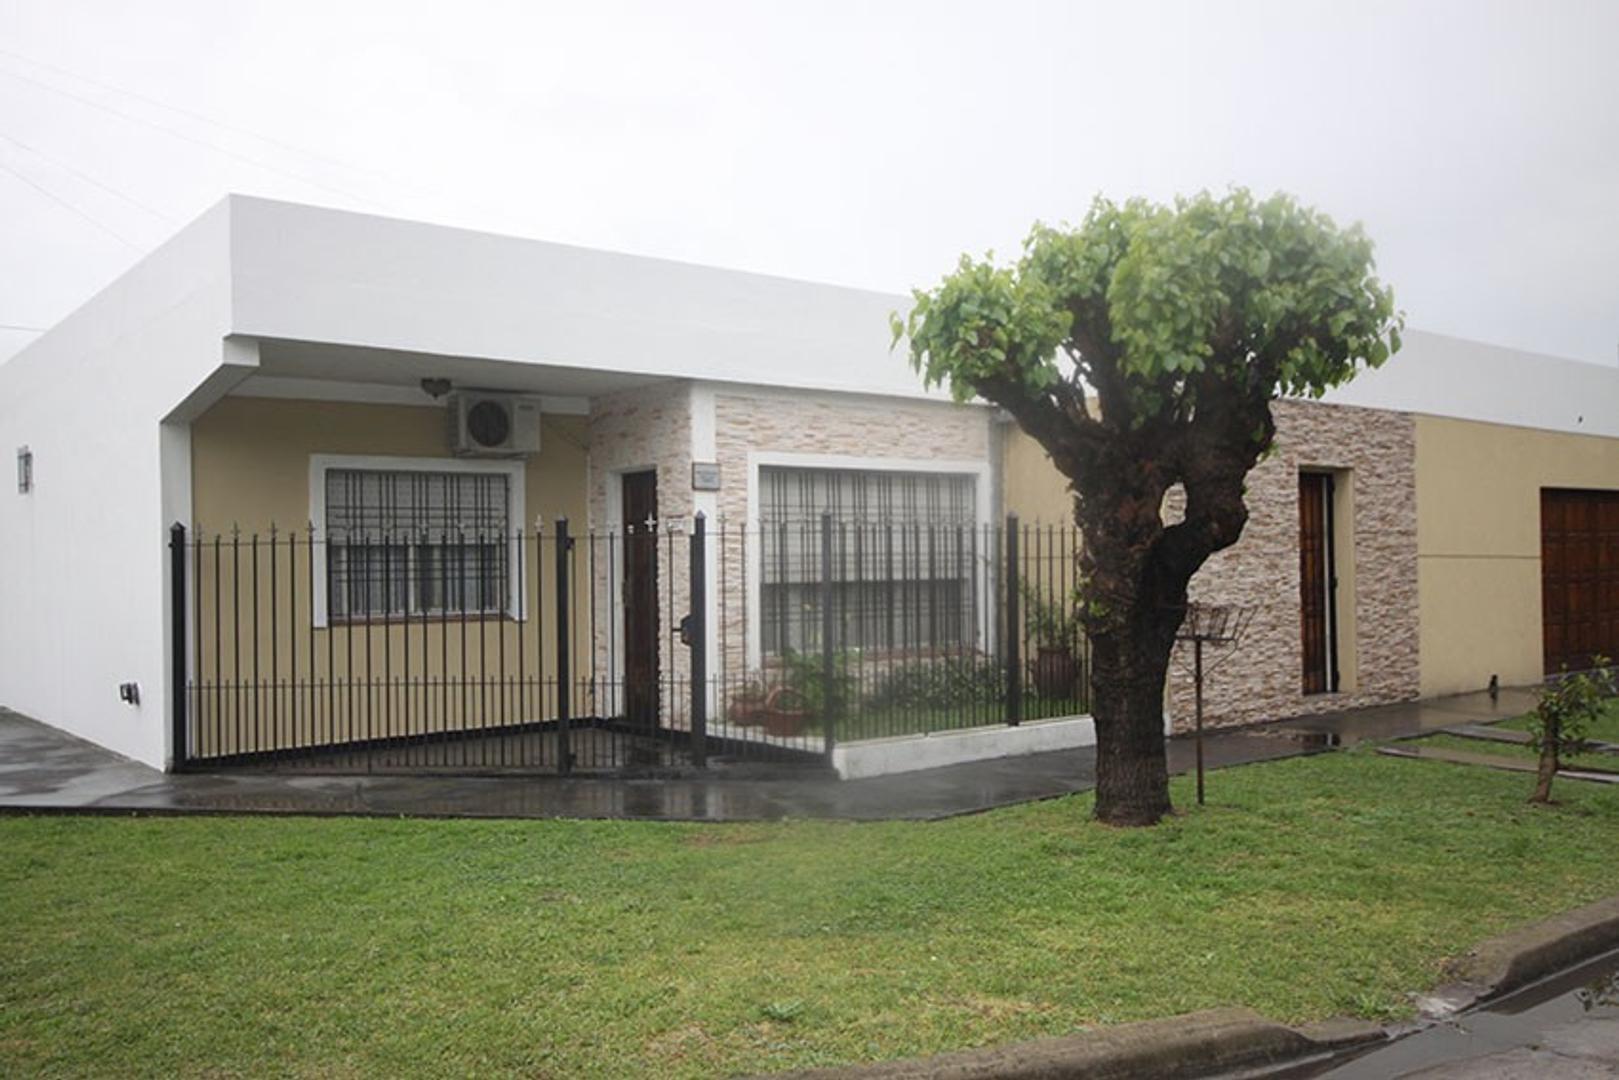 Casa - Venta - Argentina, Ituzaingó - Dr. Honorio Pueyrredon 2001